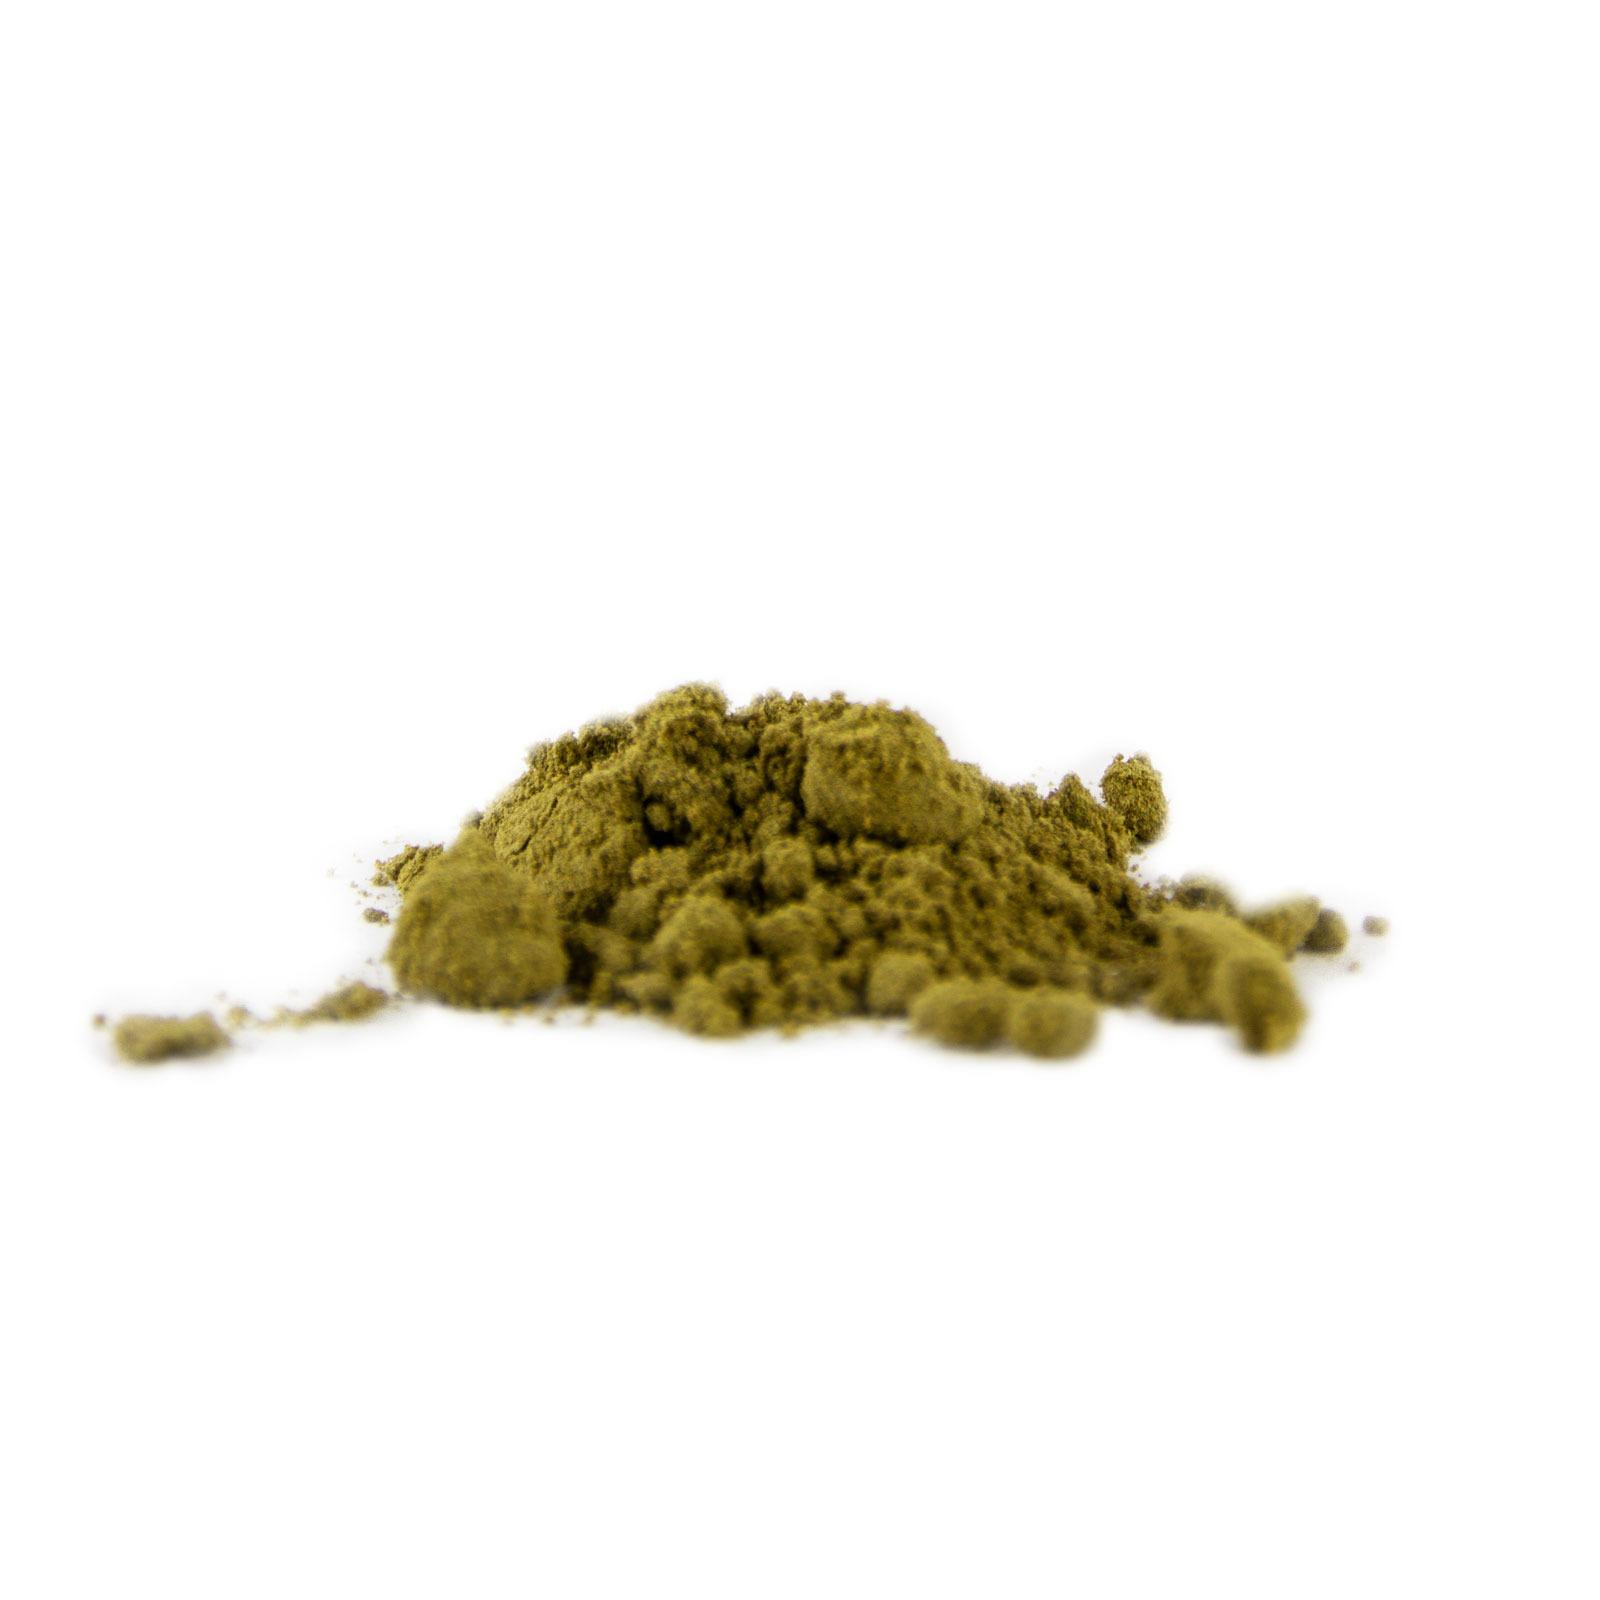 Image de variété Pollen Jaune de Cannabis CBD 100% légal